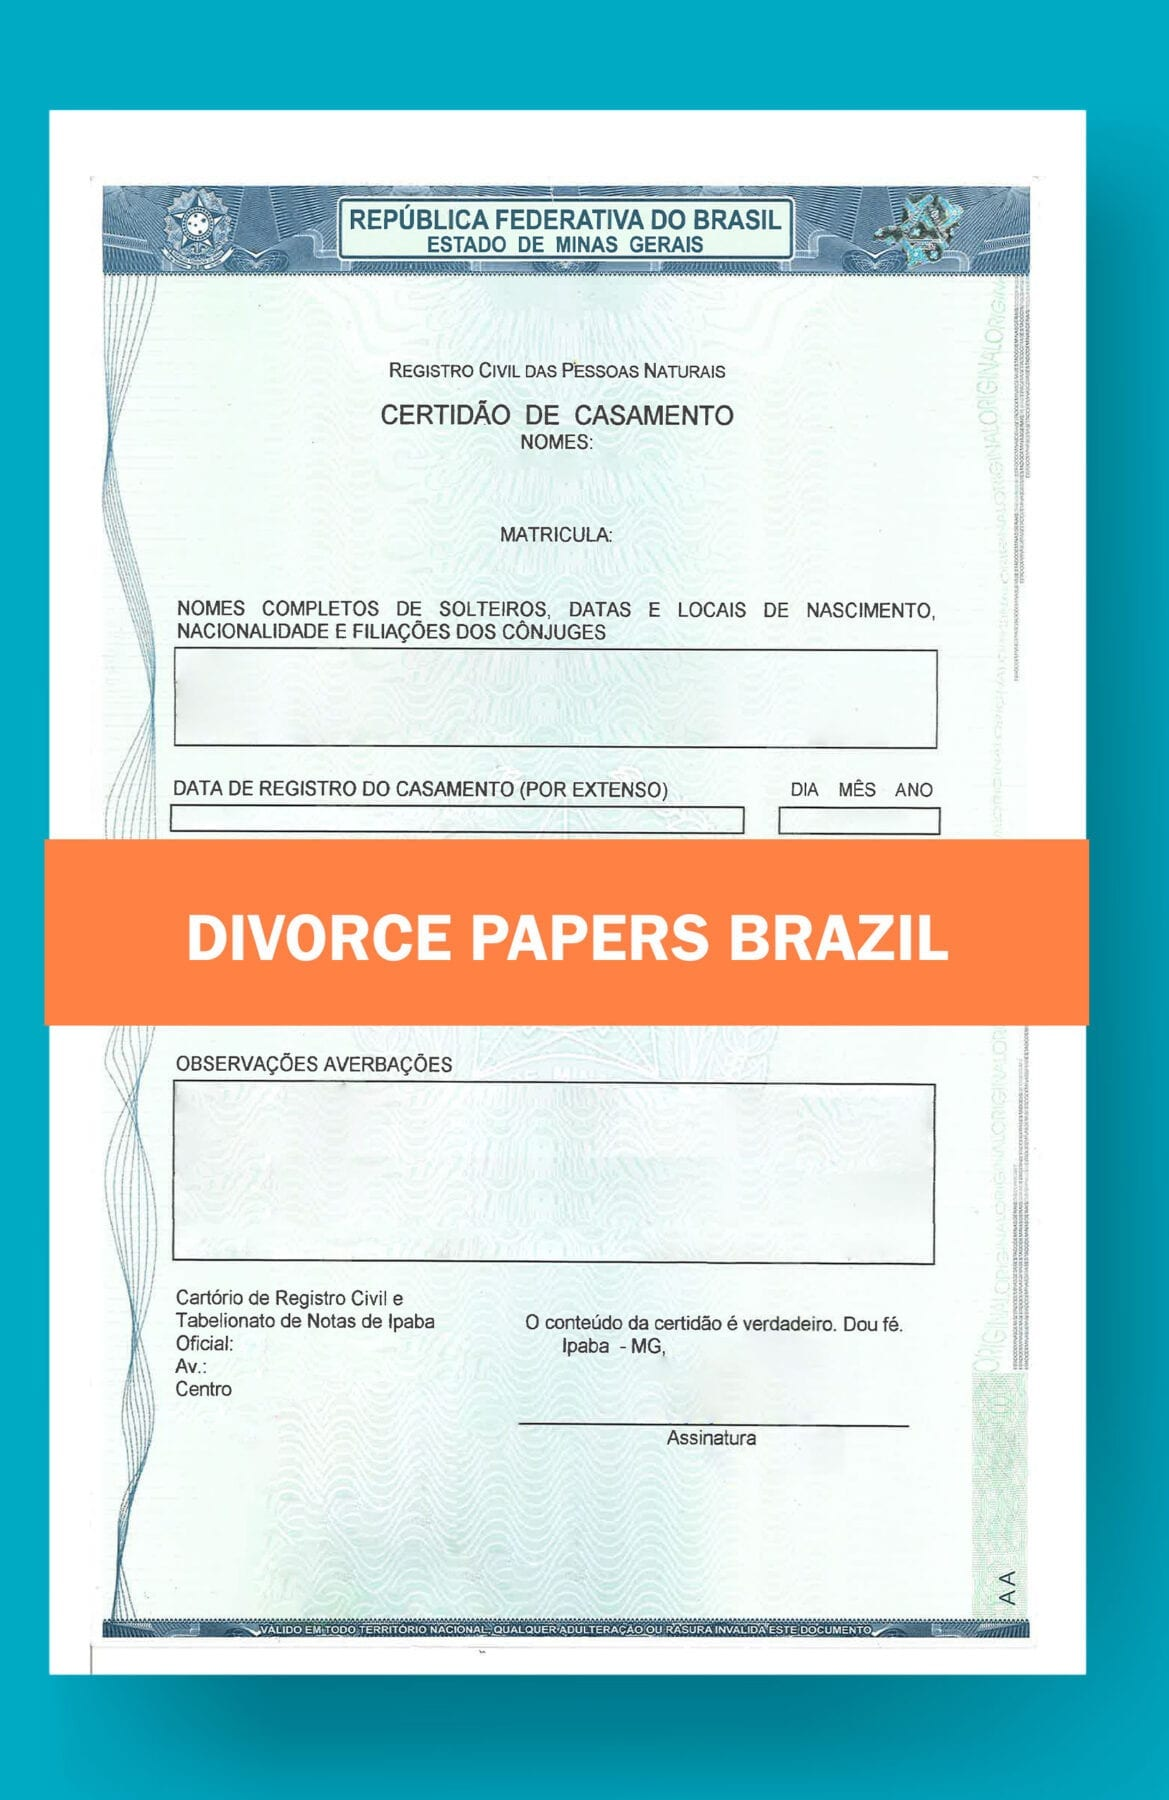 DIVORCE-PAPERS-BRAZIL